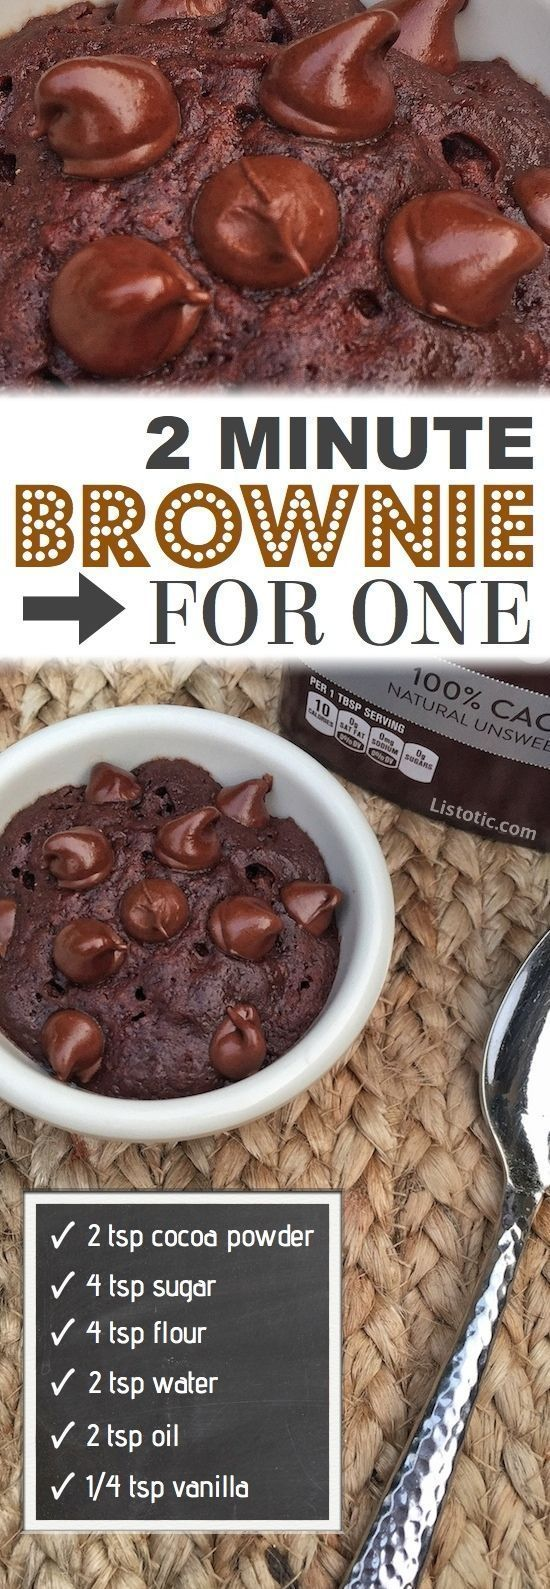 Easy 2 Minute Microwave Brownie In A Mug (or ramekin!) - Soukaina Maiza #chocolatedessertrecipes